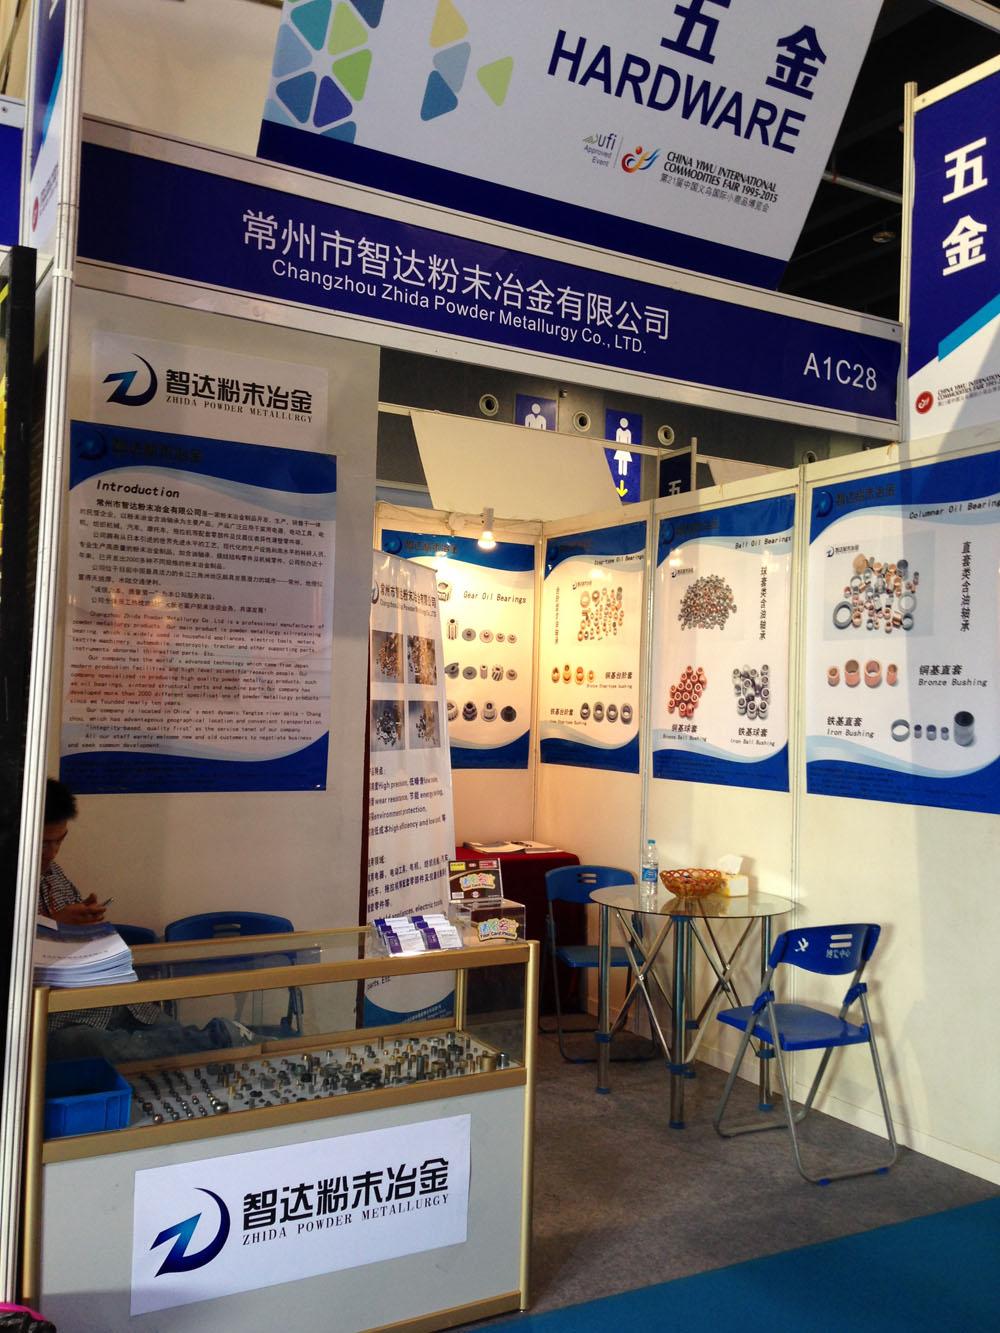 The 21st China Yiwu International Commodities Fair